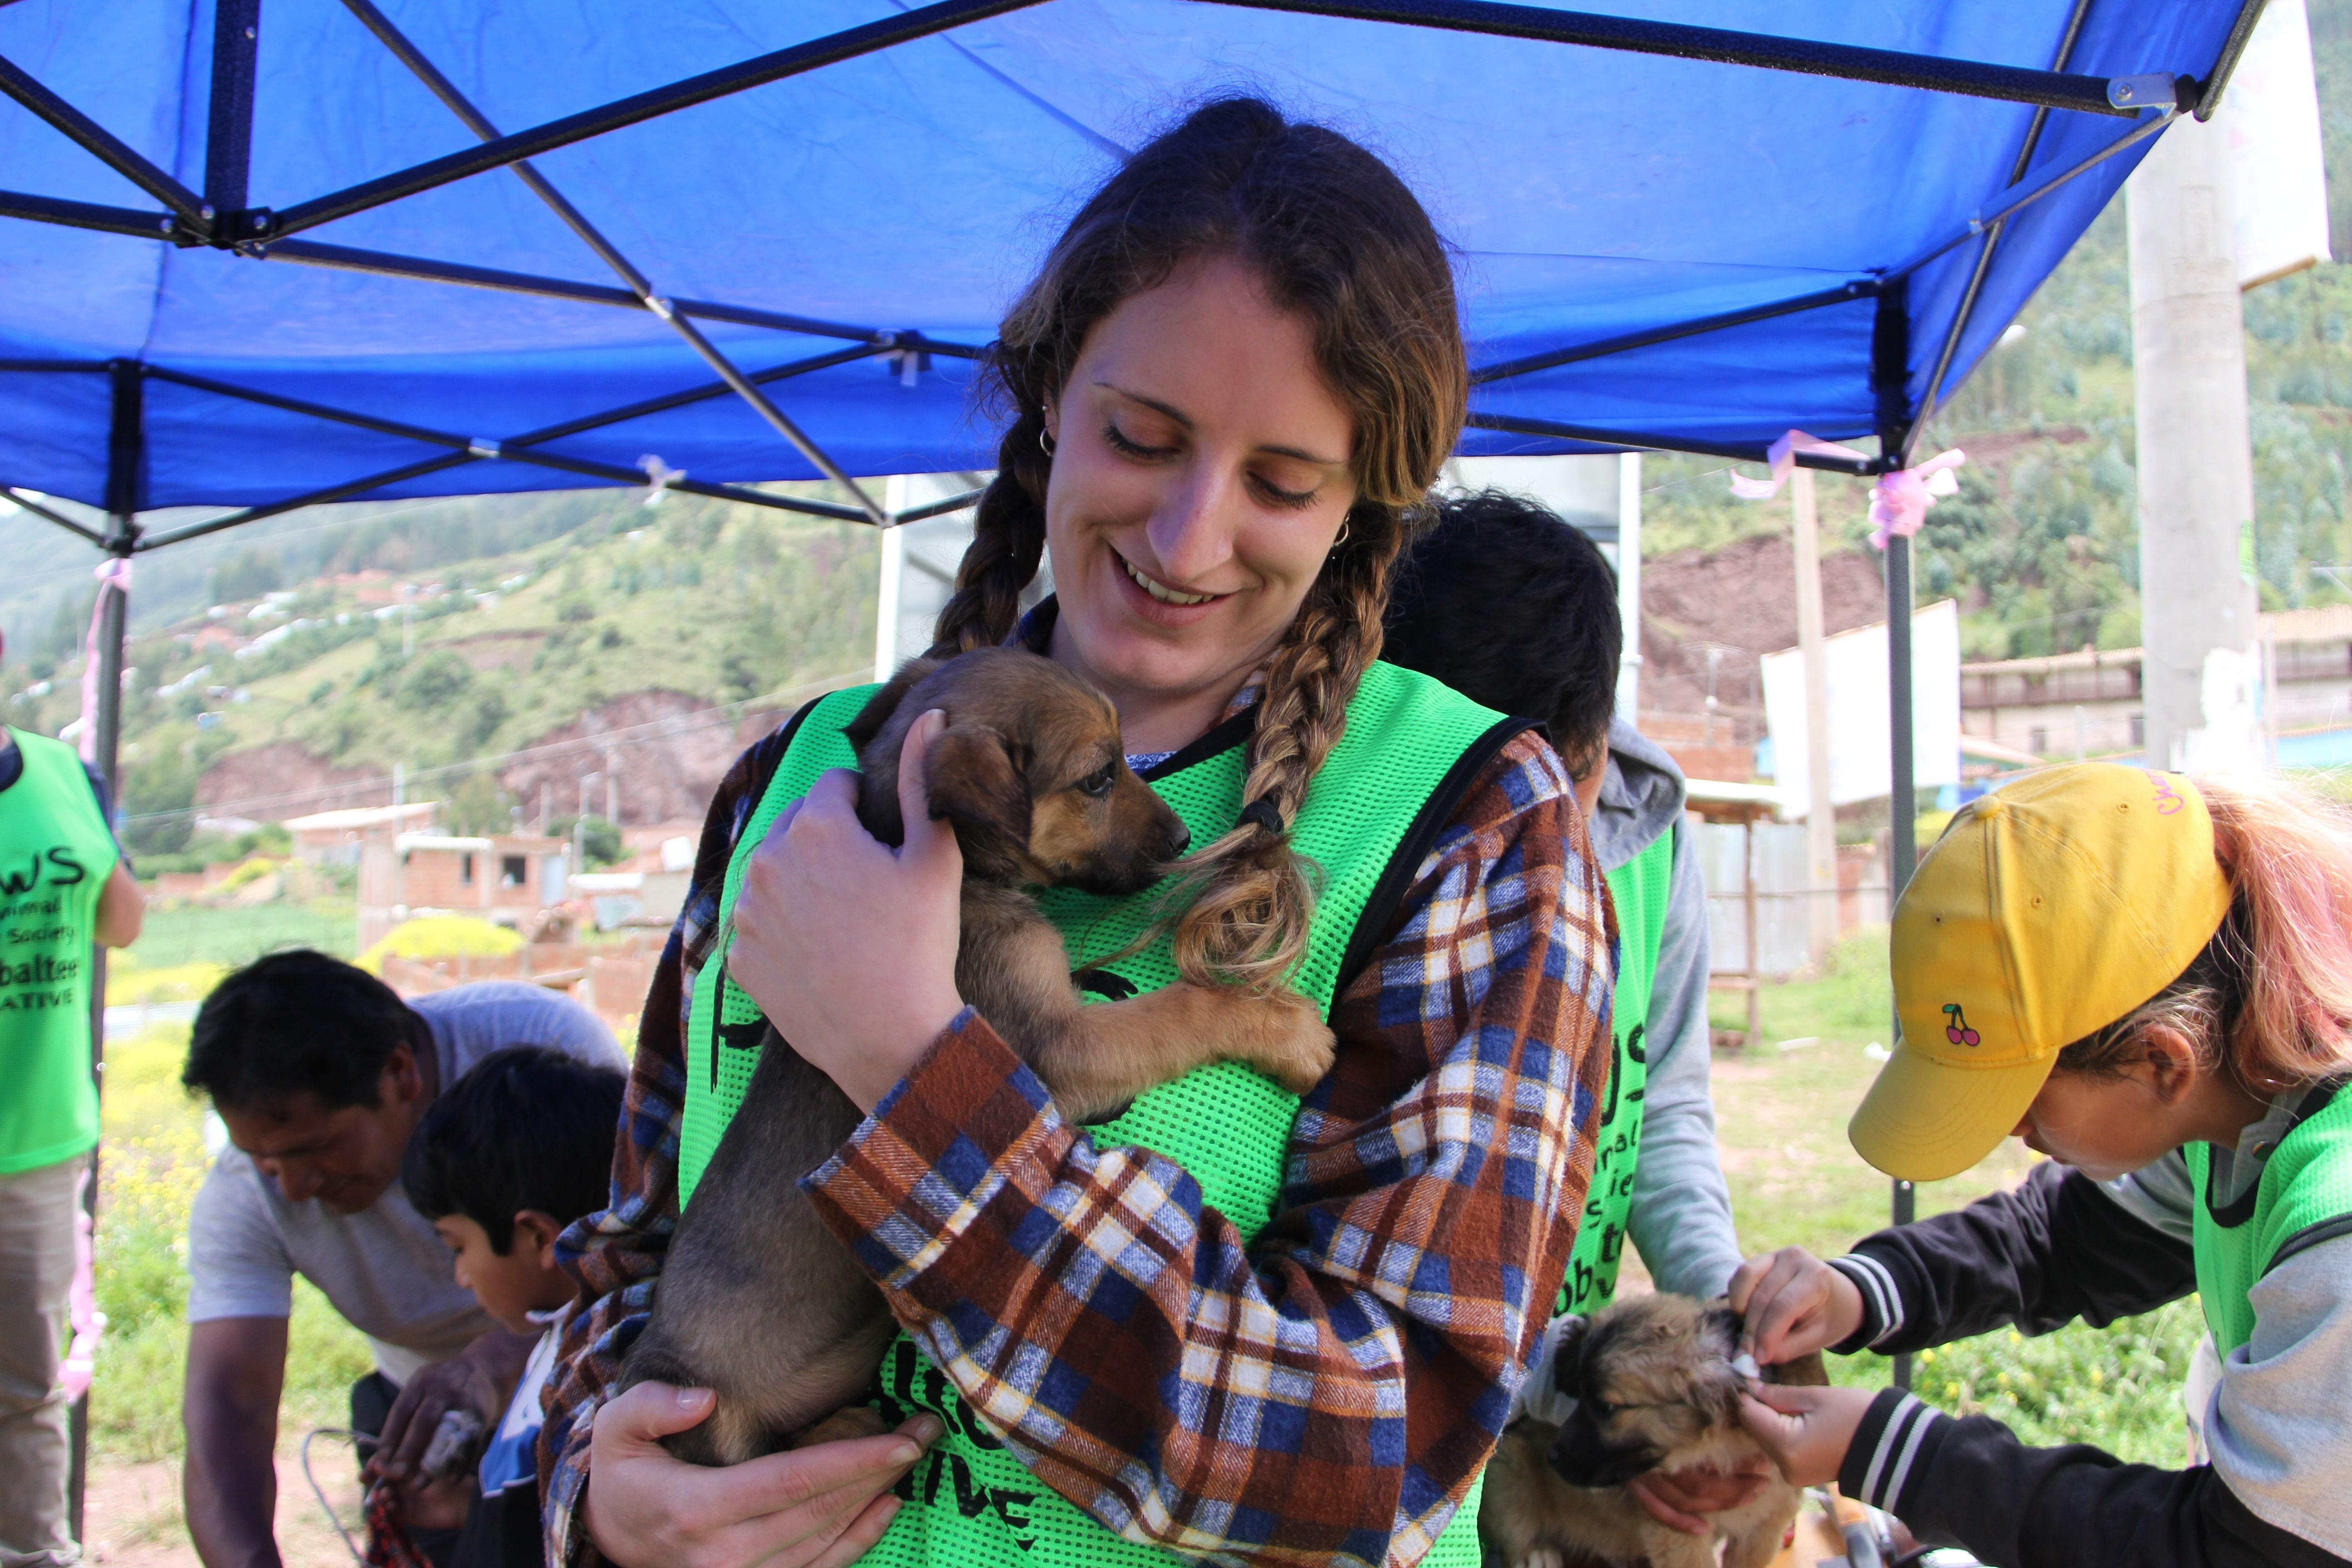 PAWS Animal Welfare Campaign